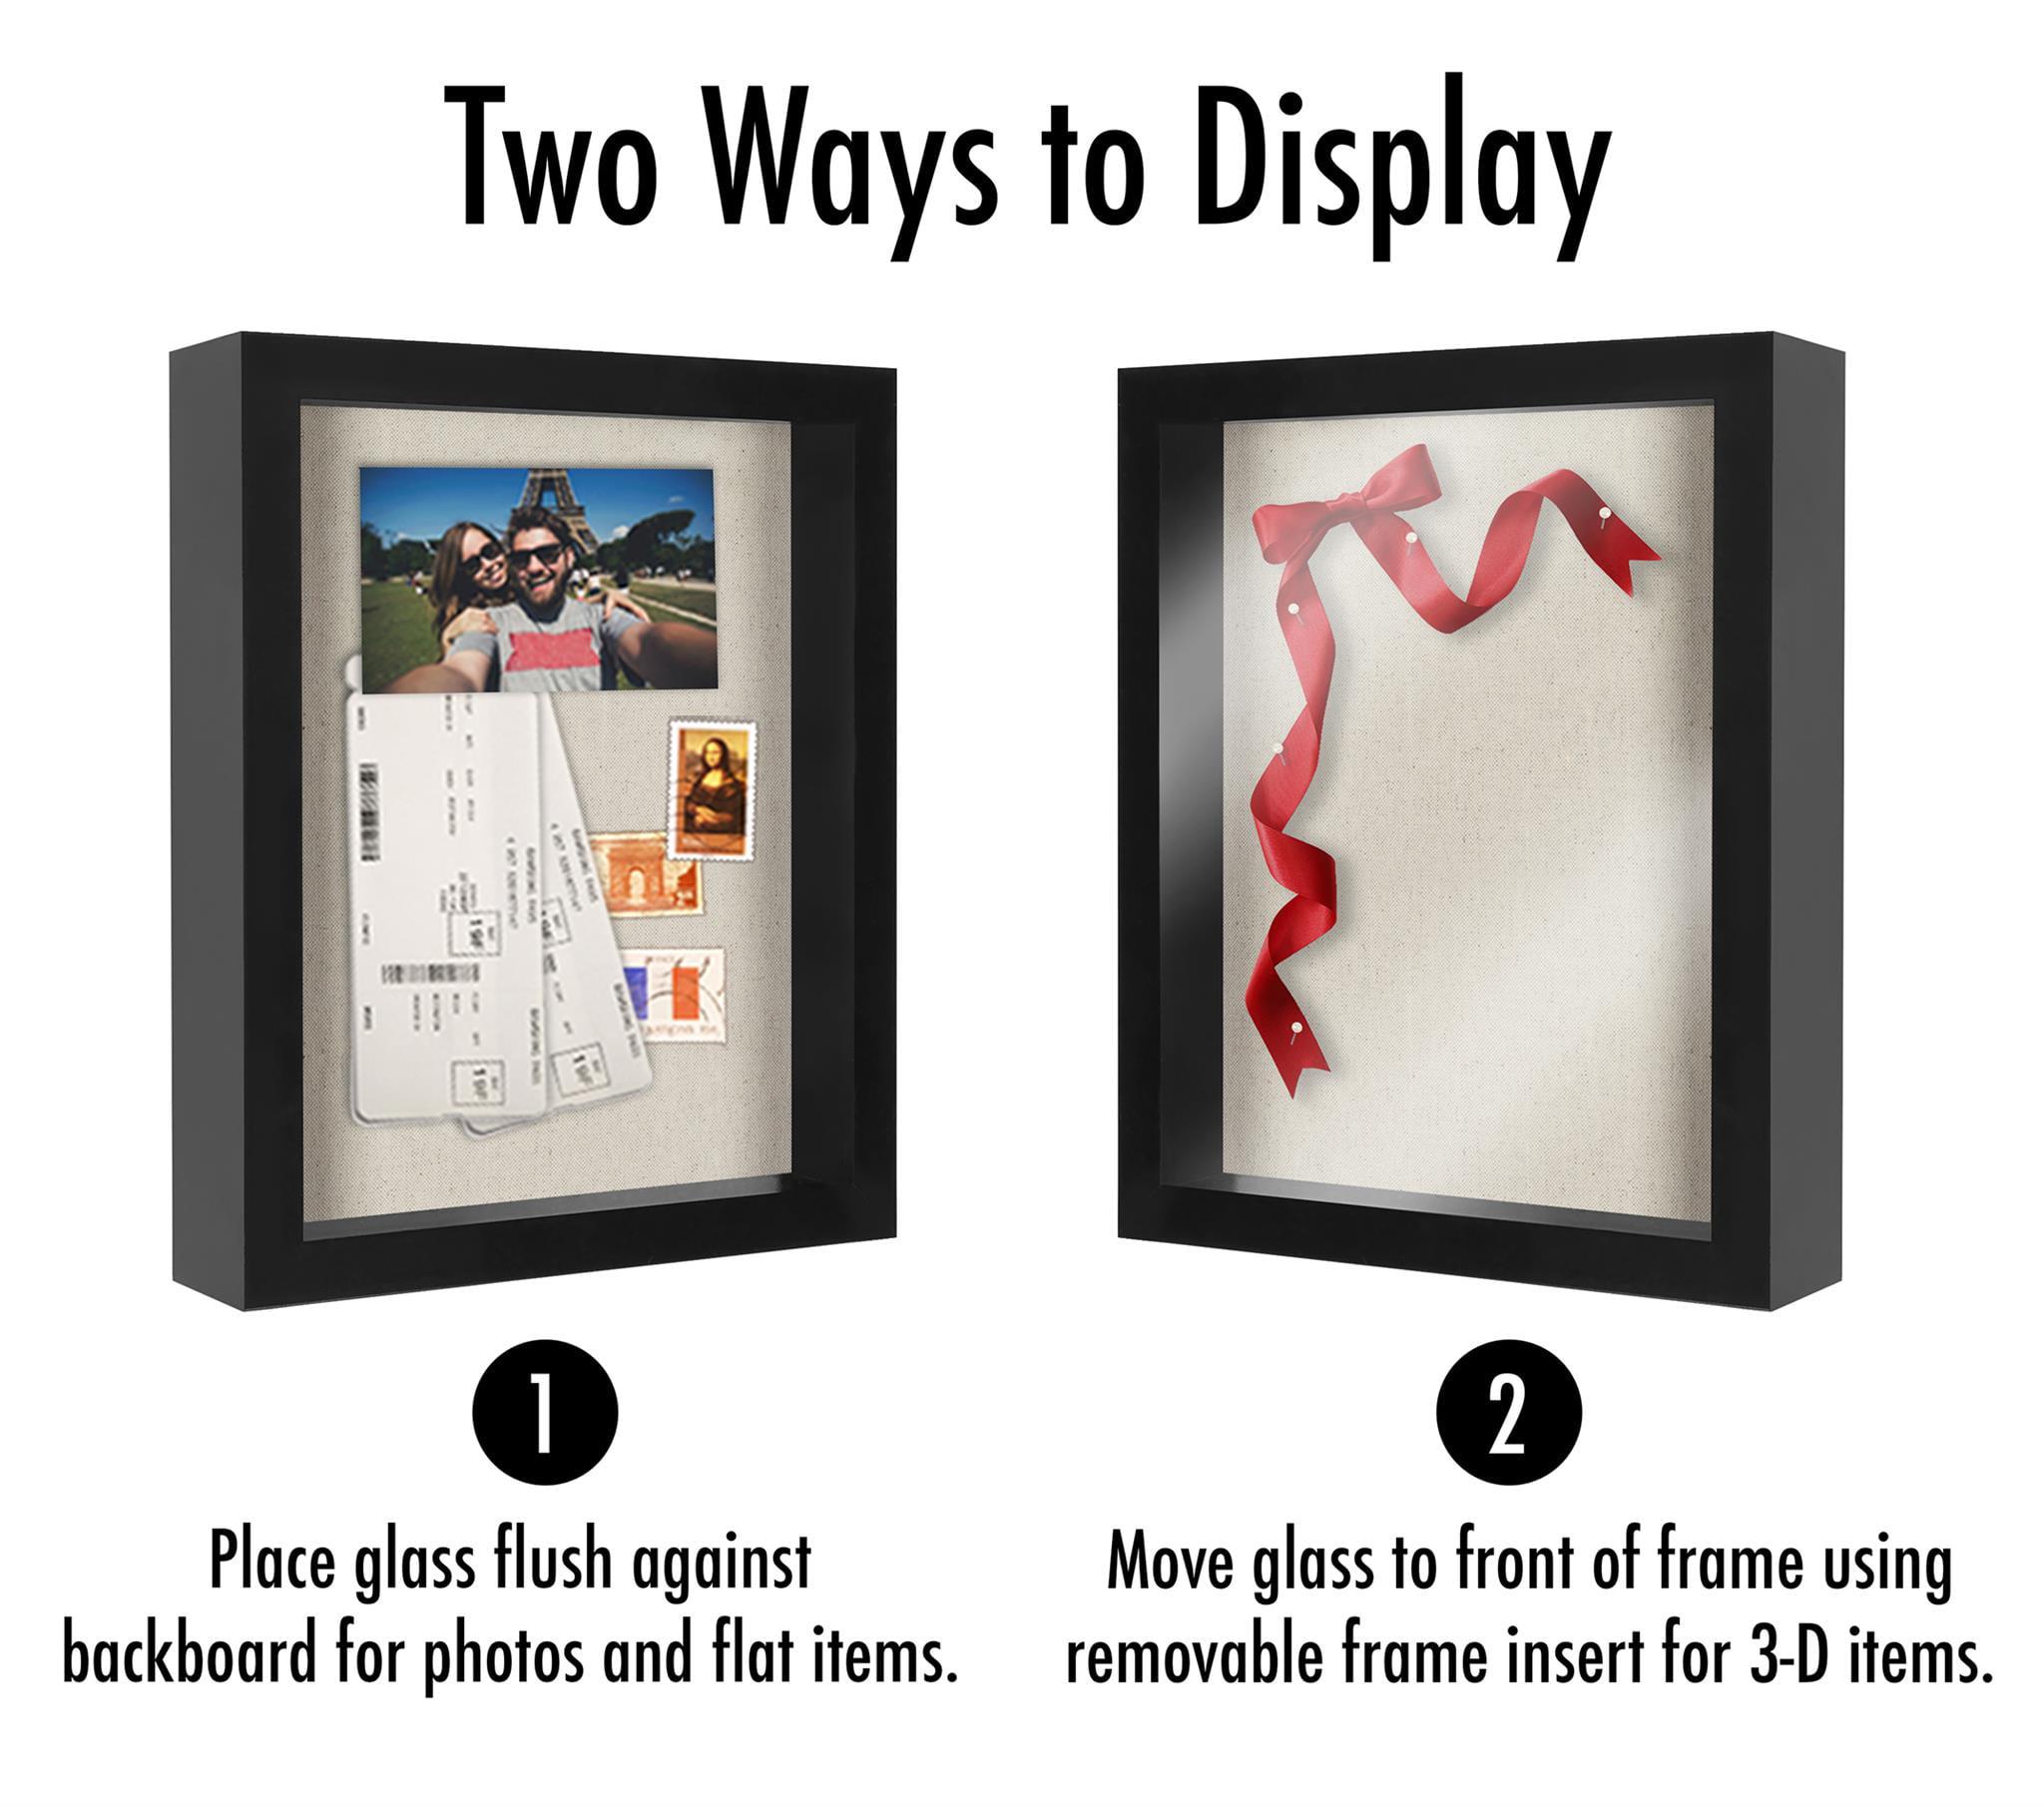 8.5x11 Document Shadow Box Frame with Soft Linen Back - Walmart.com